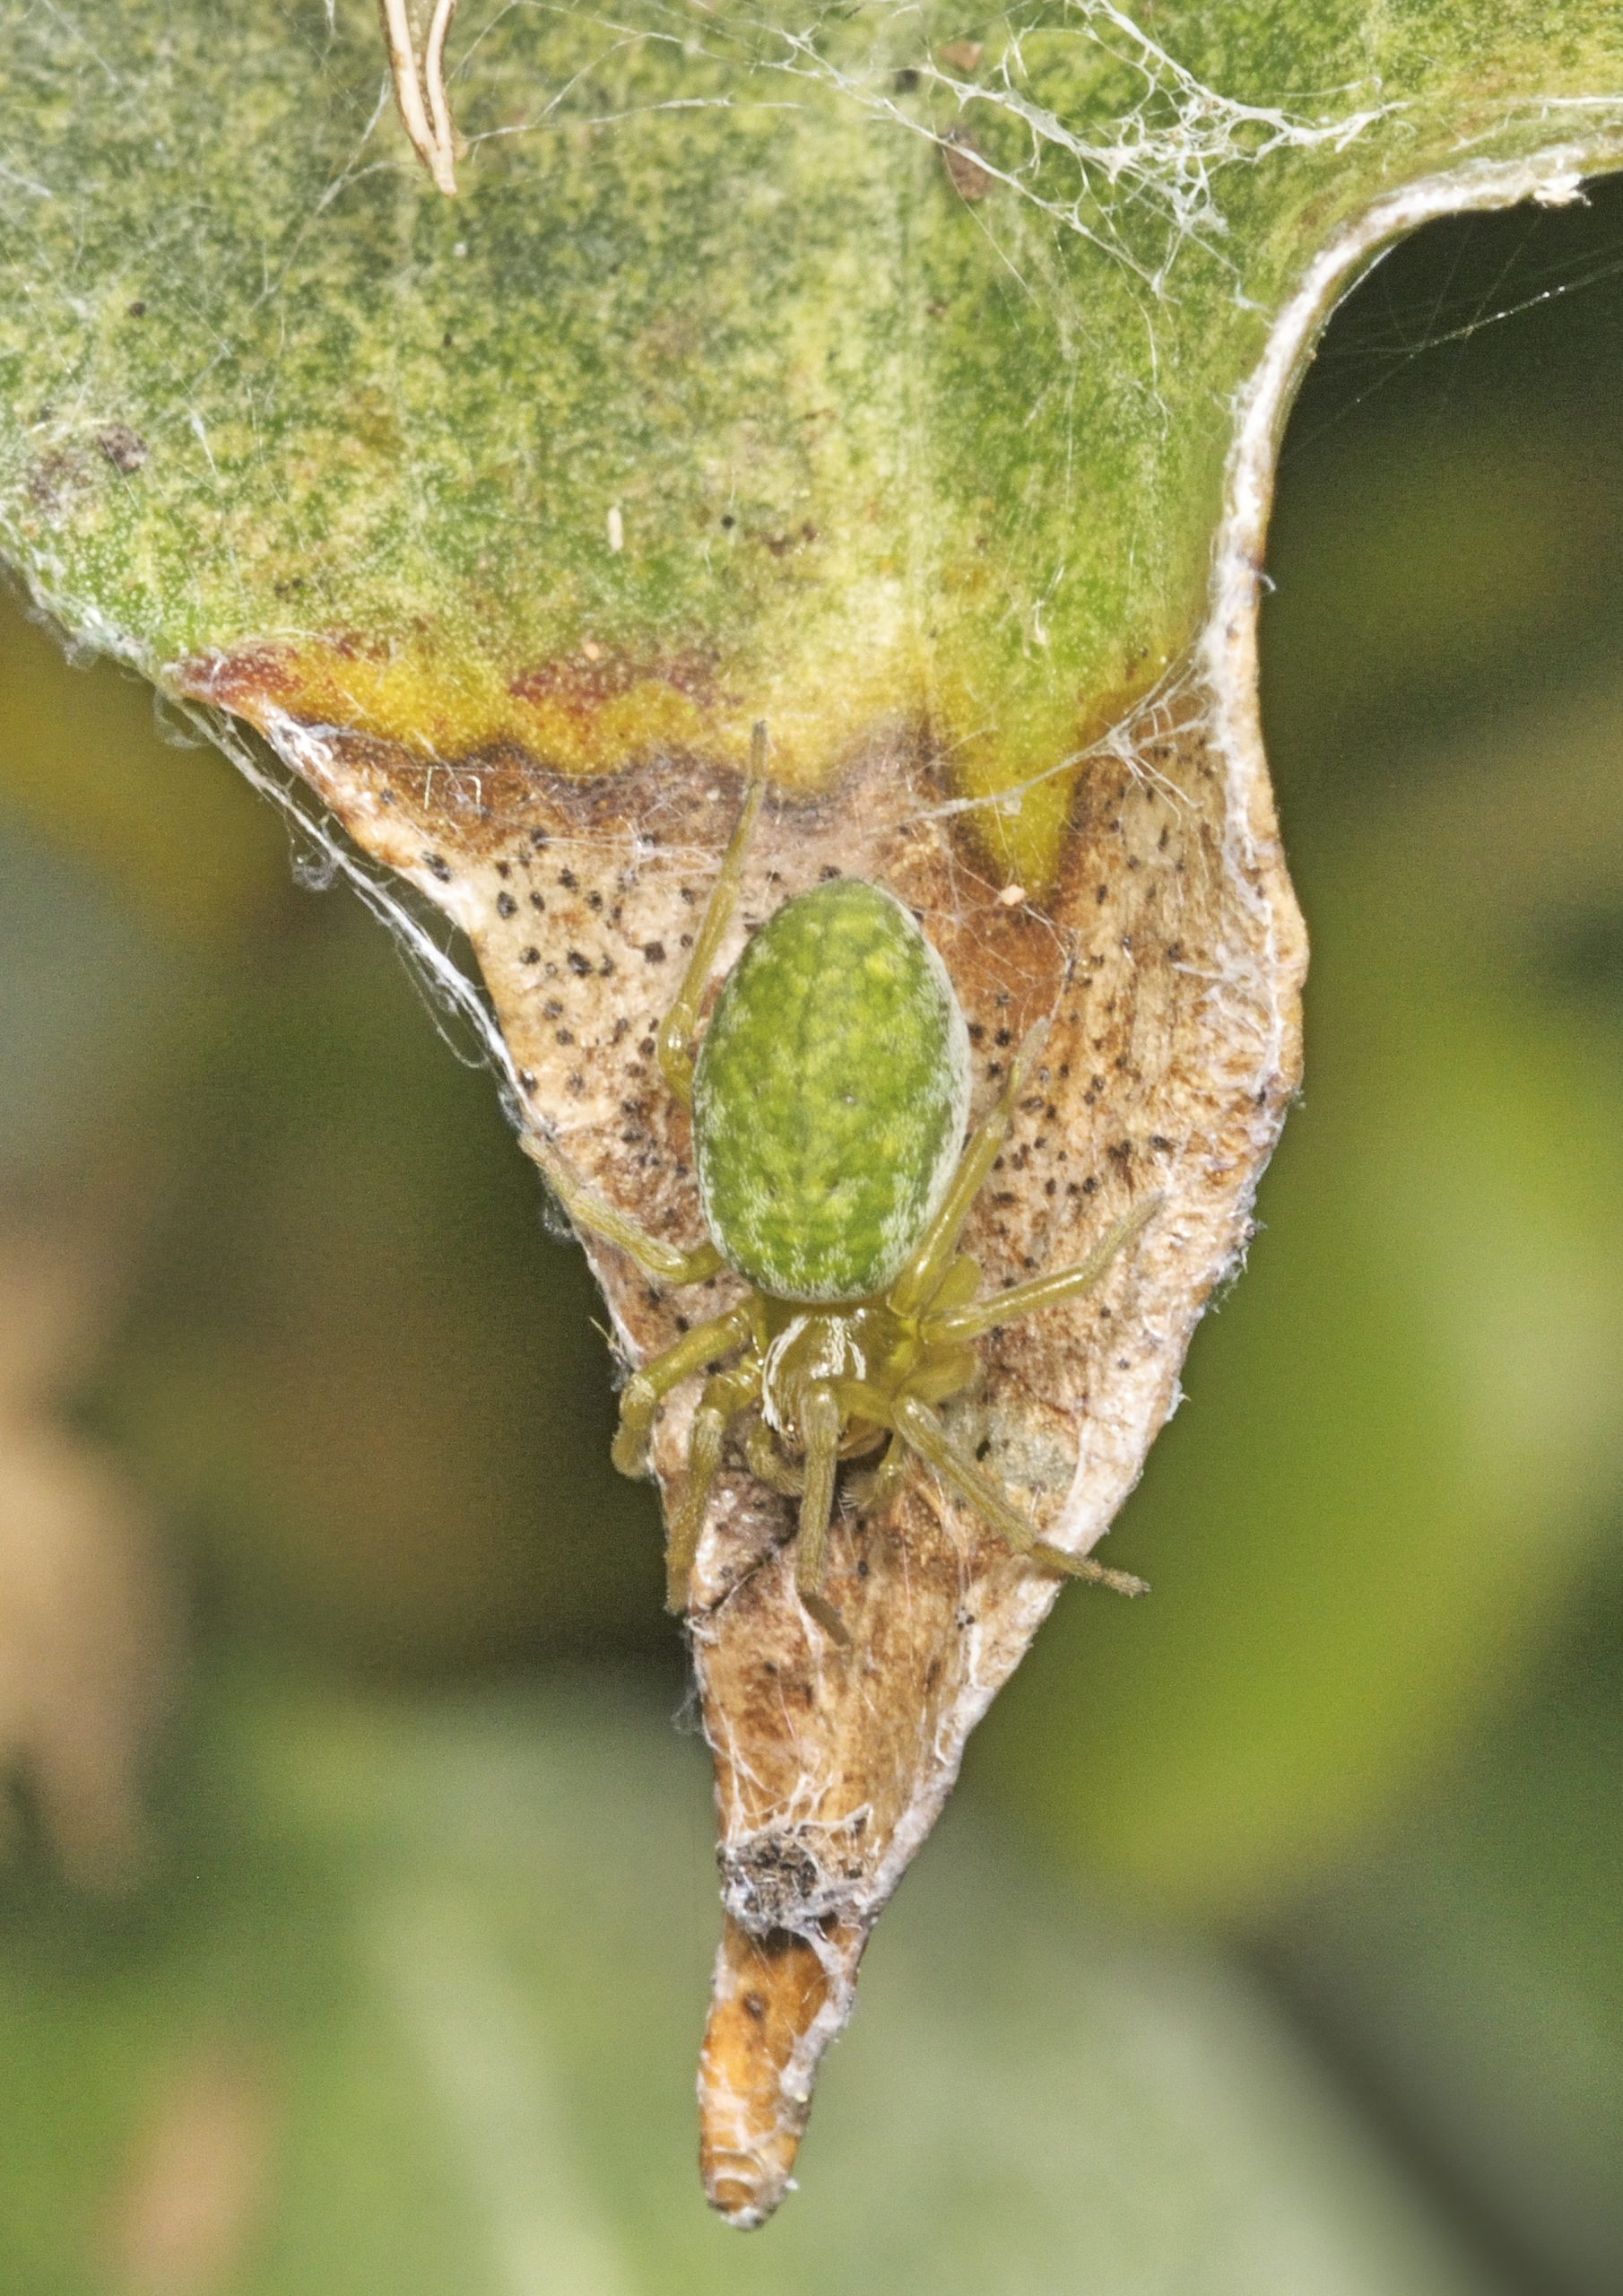 Nigma walckenaeri female - Roger Plant